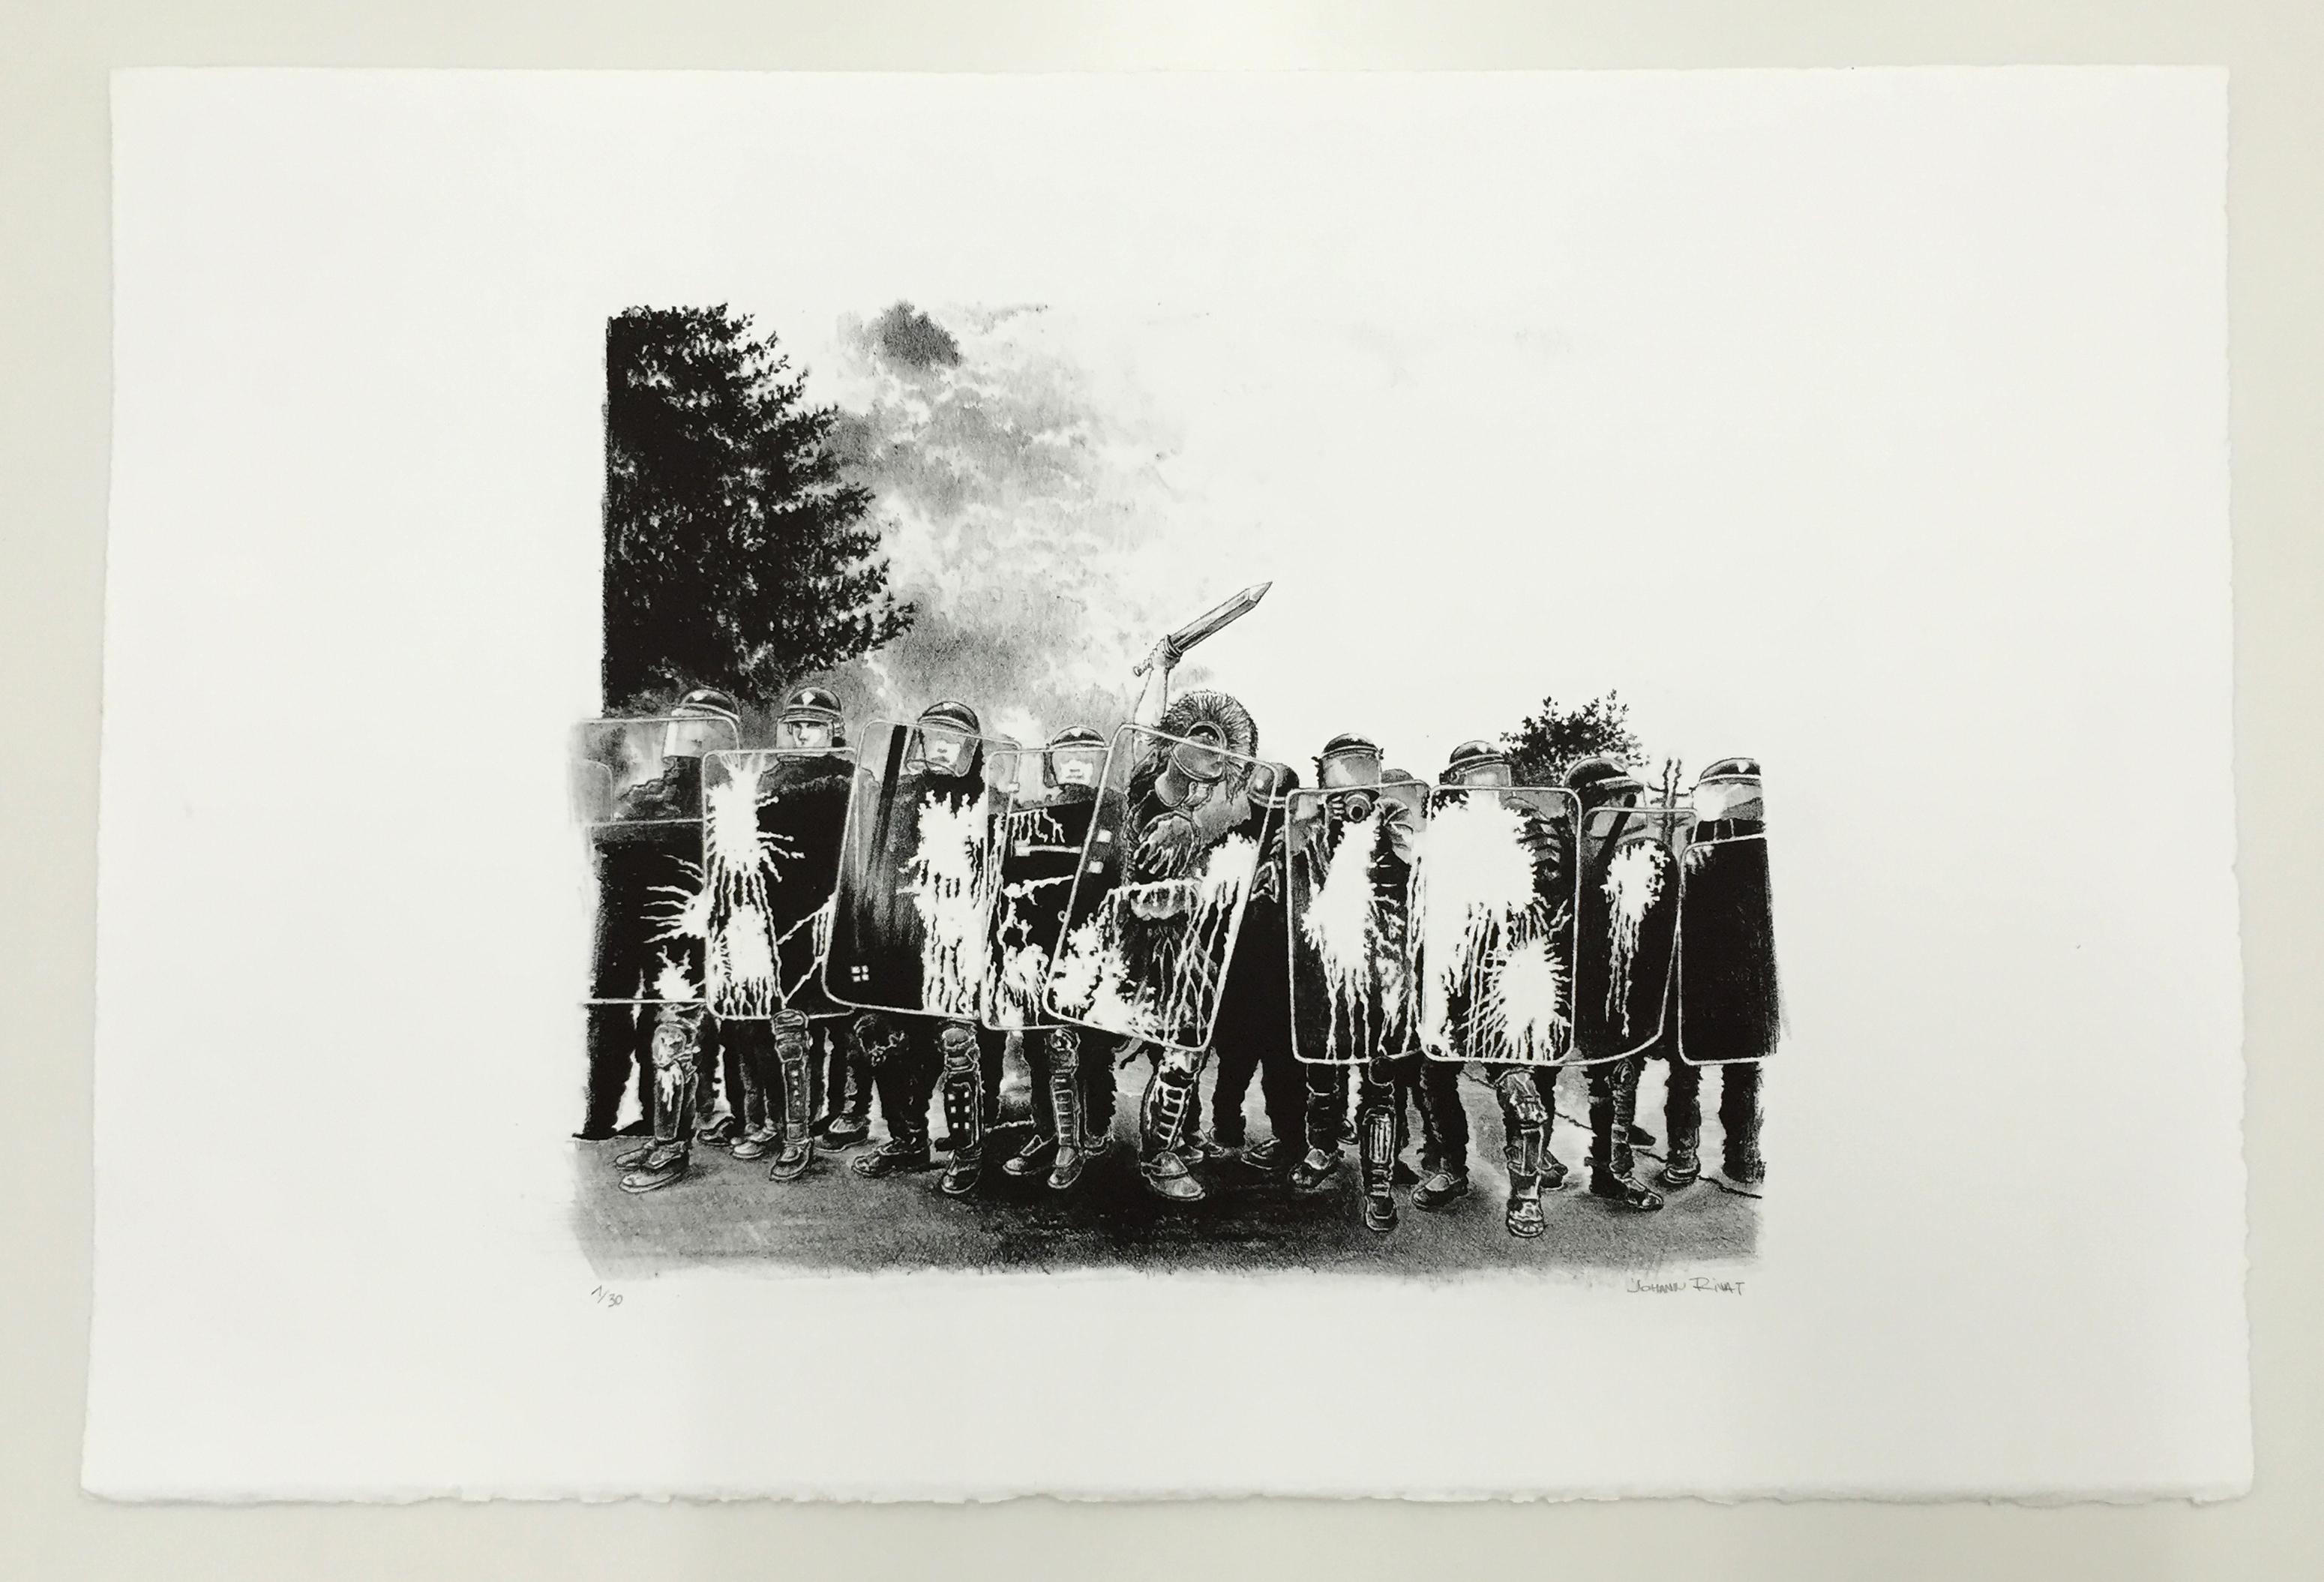 Galerie metropolis johann rivat lithographie original